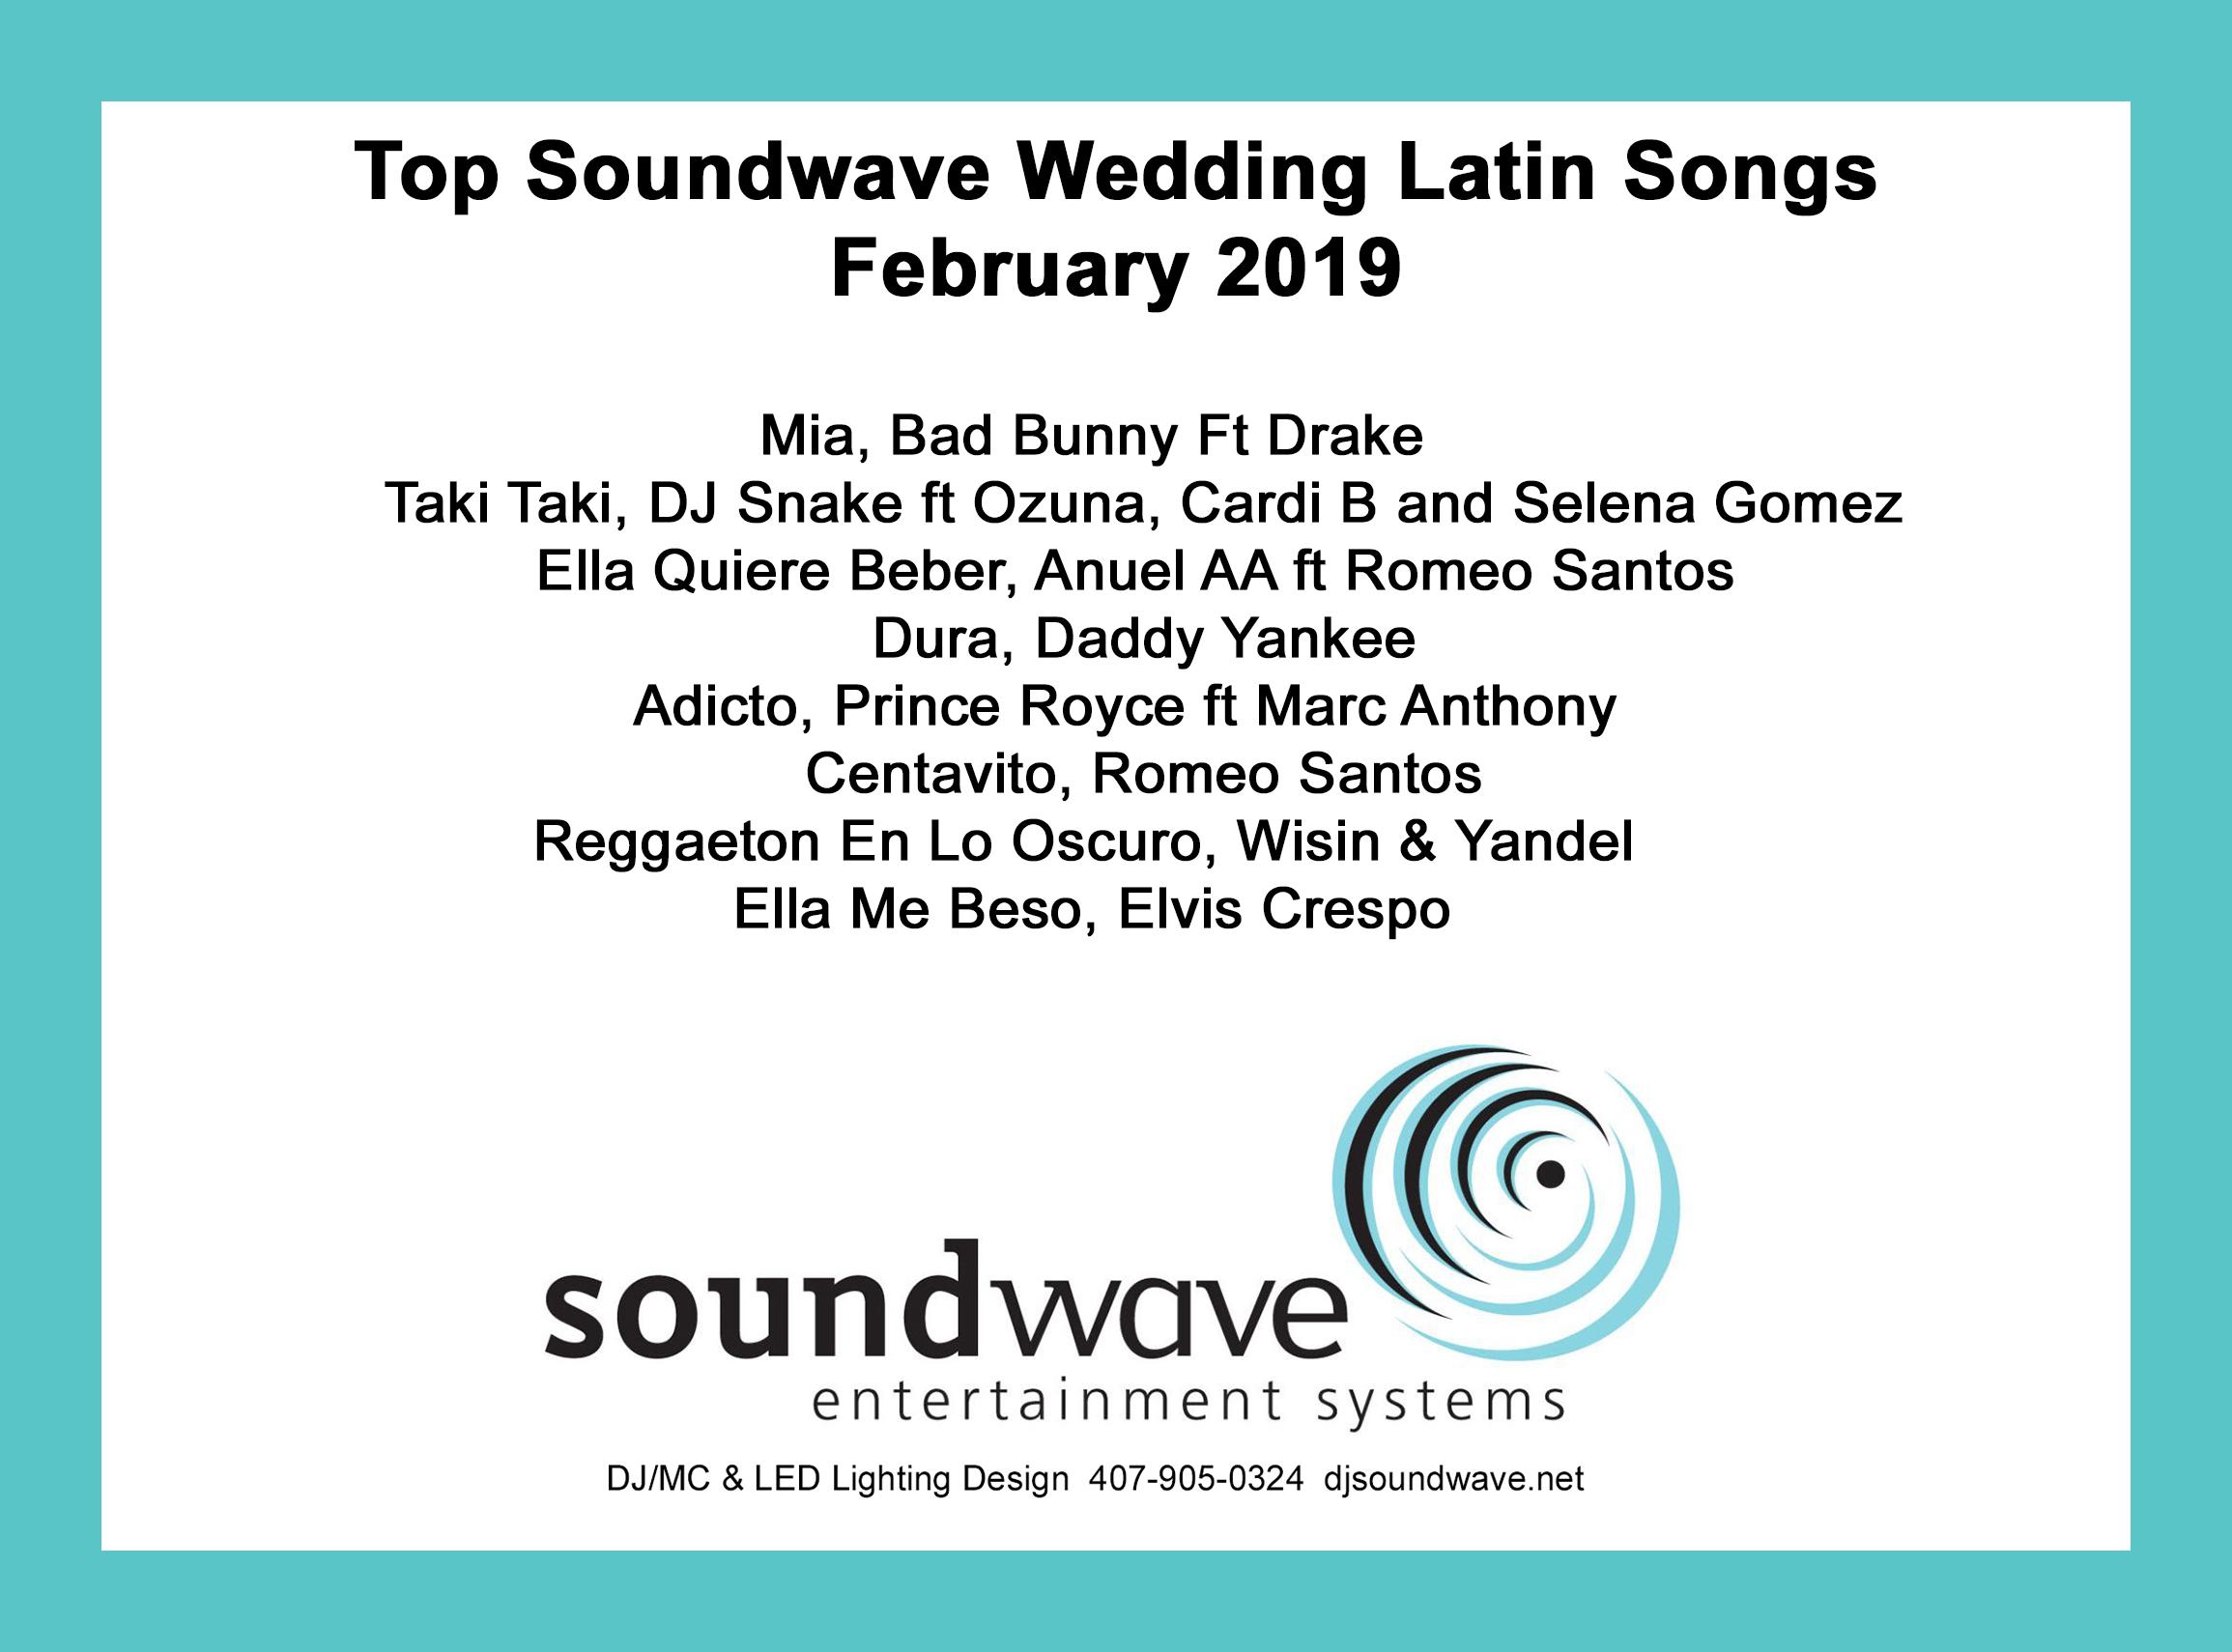 latin wedding songs - latin songs - orlando latin dj - soundwave entertainement